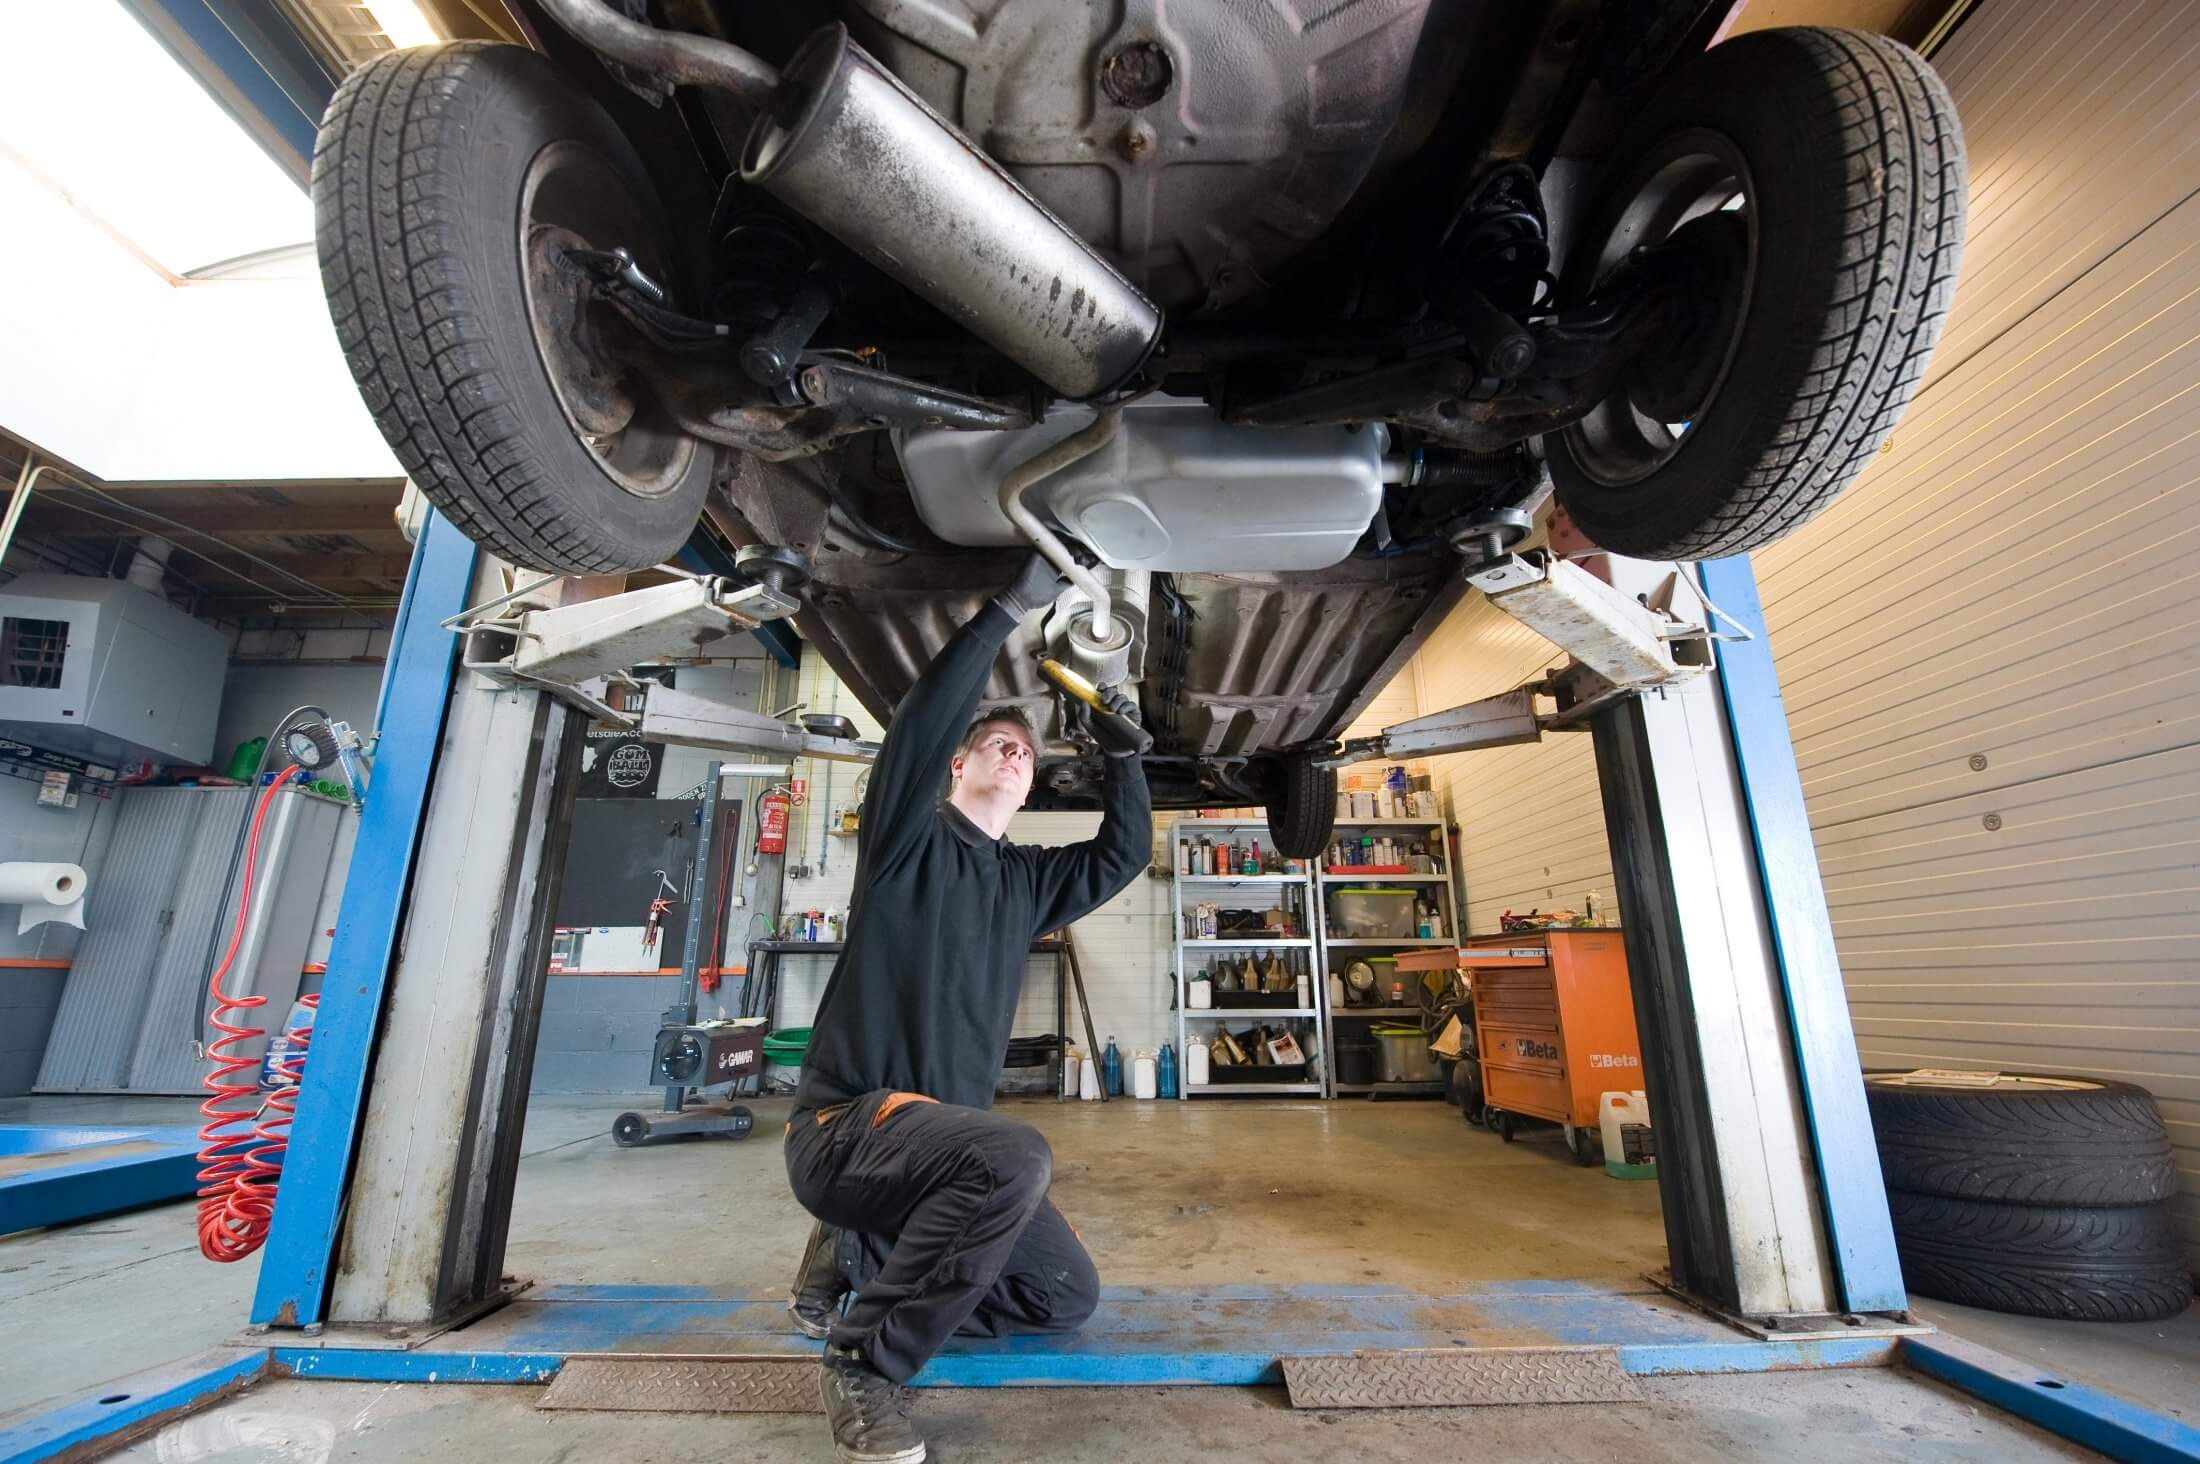 Mechanic Servicing Car